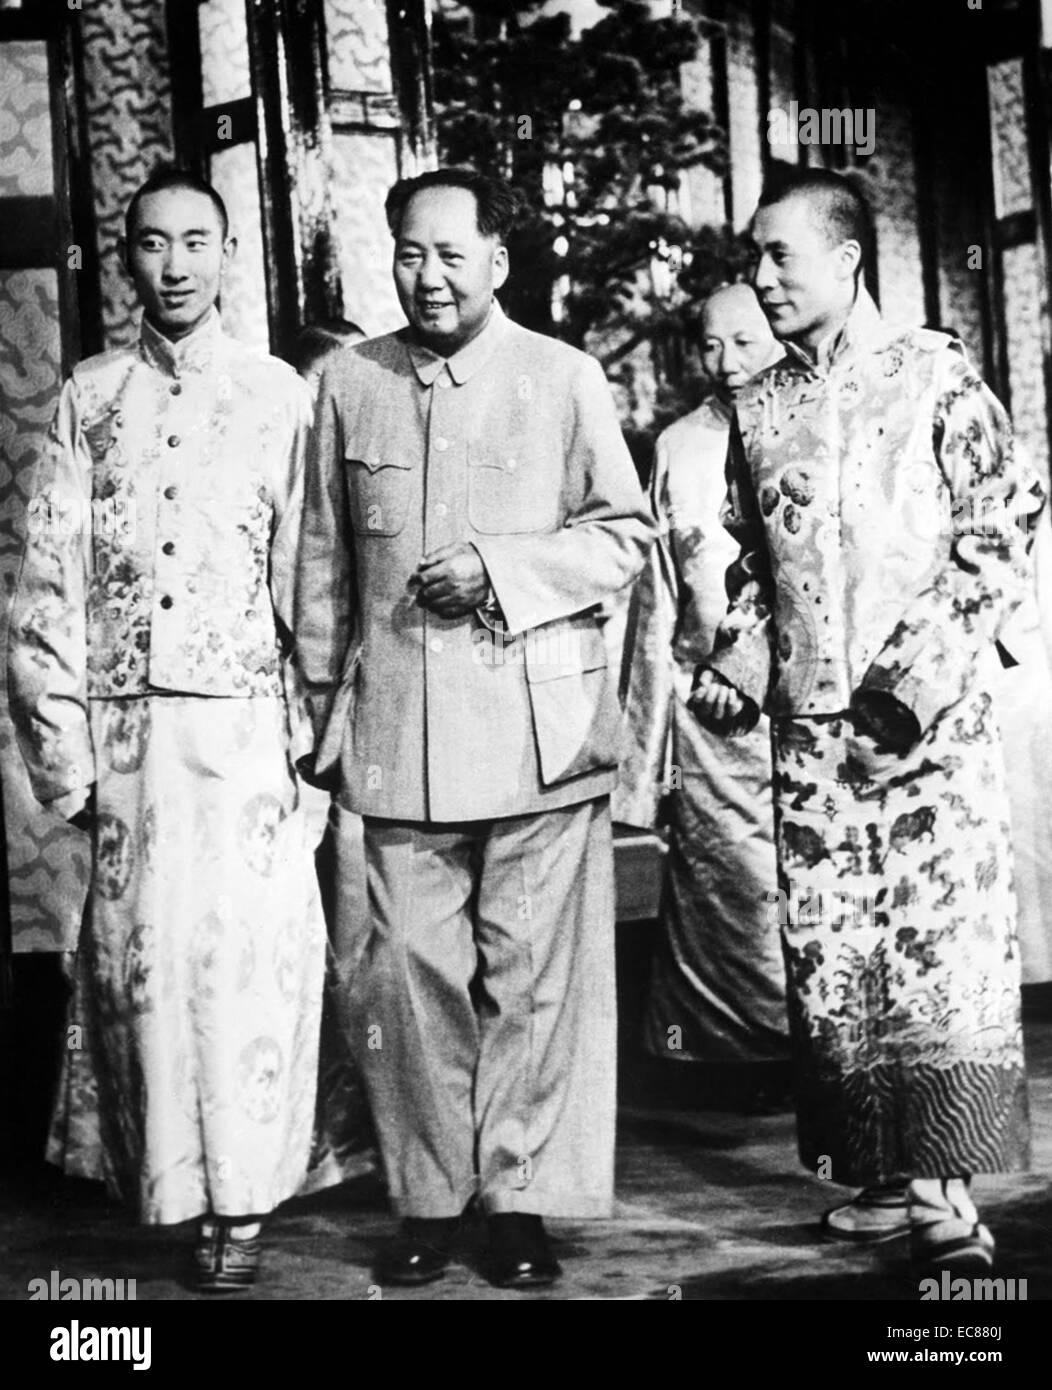 Photograph of Pachen Lama, Mao-tse-Tung and the Dalai Lama in Beijing. Dated 1958 - Stock Image